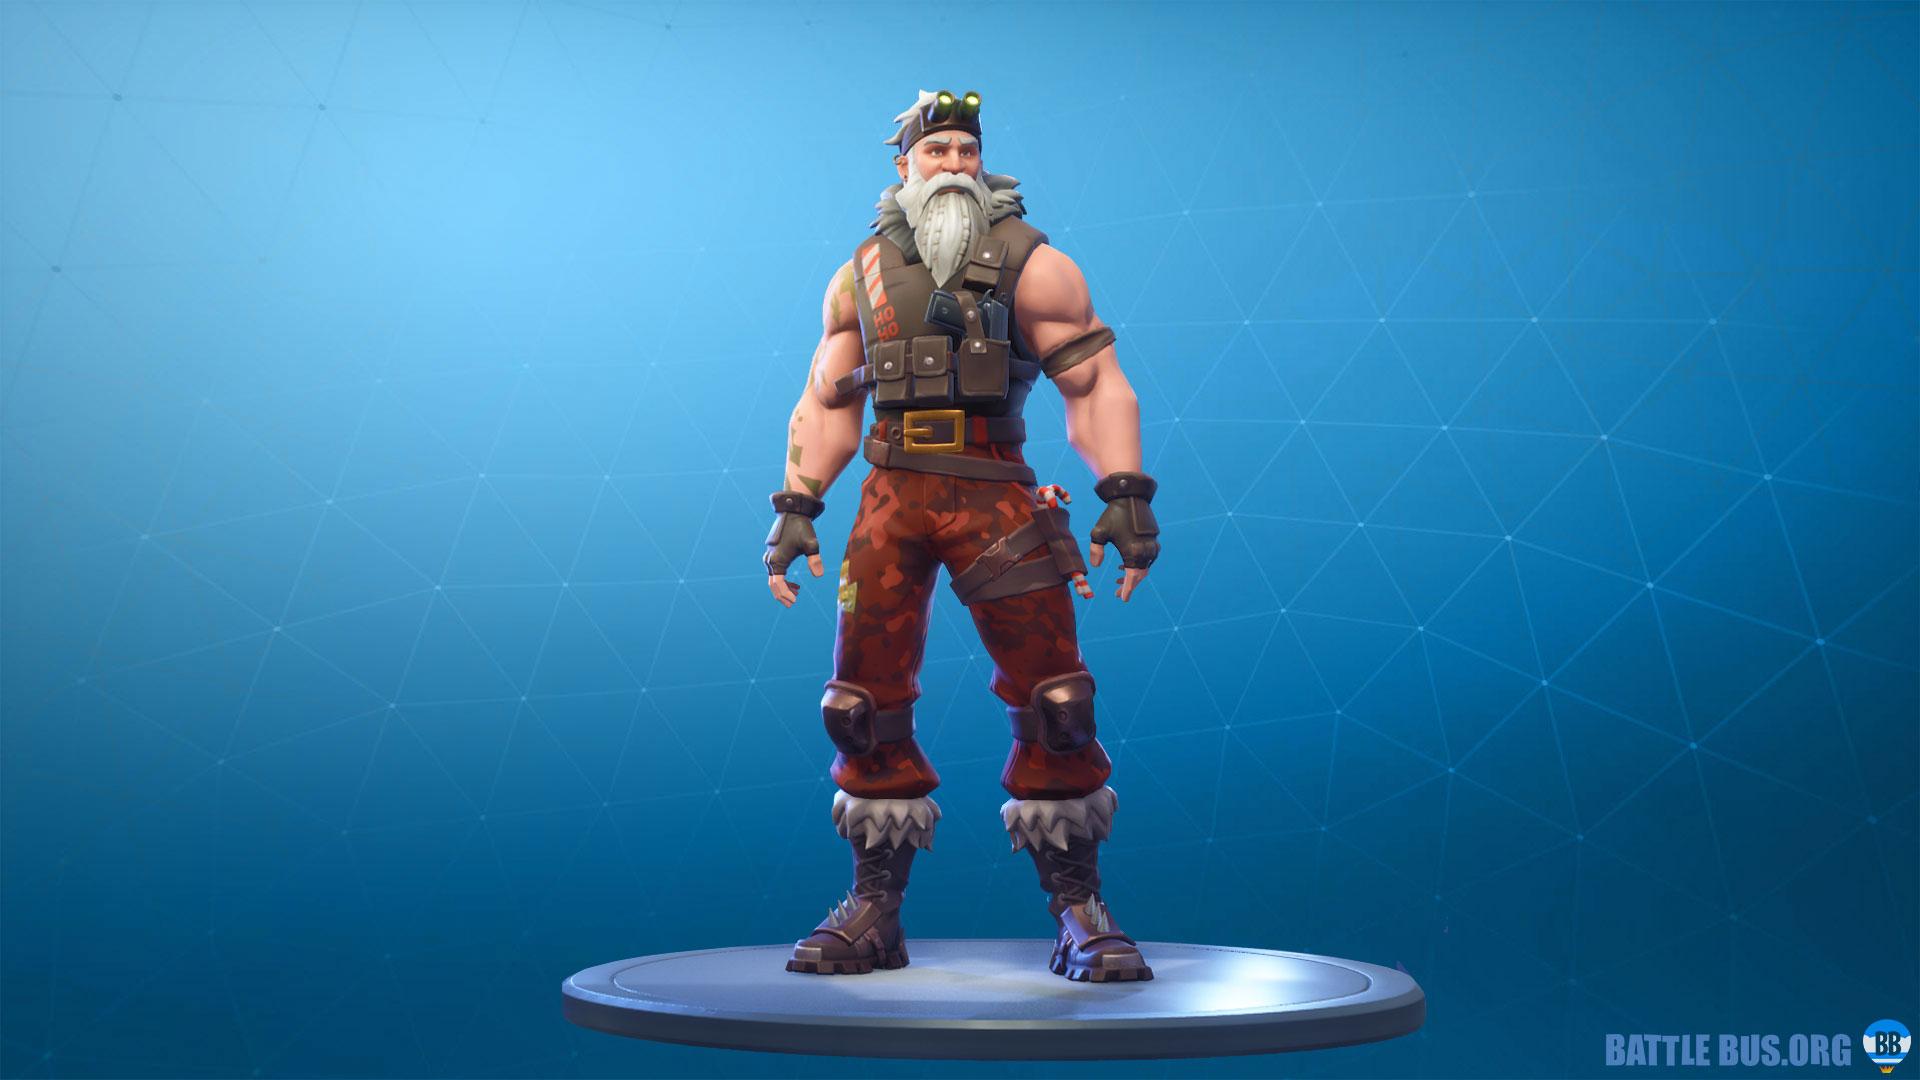 Sgt. Winter fortnite skin